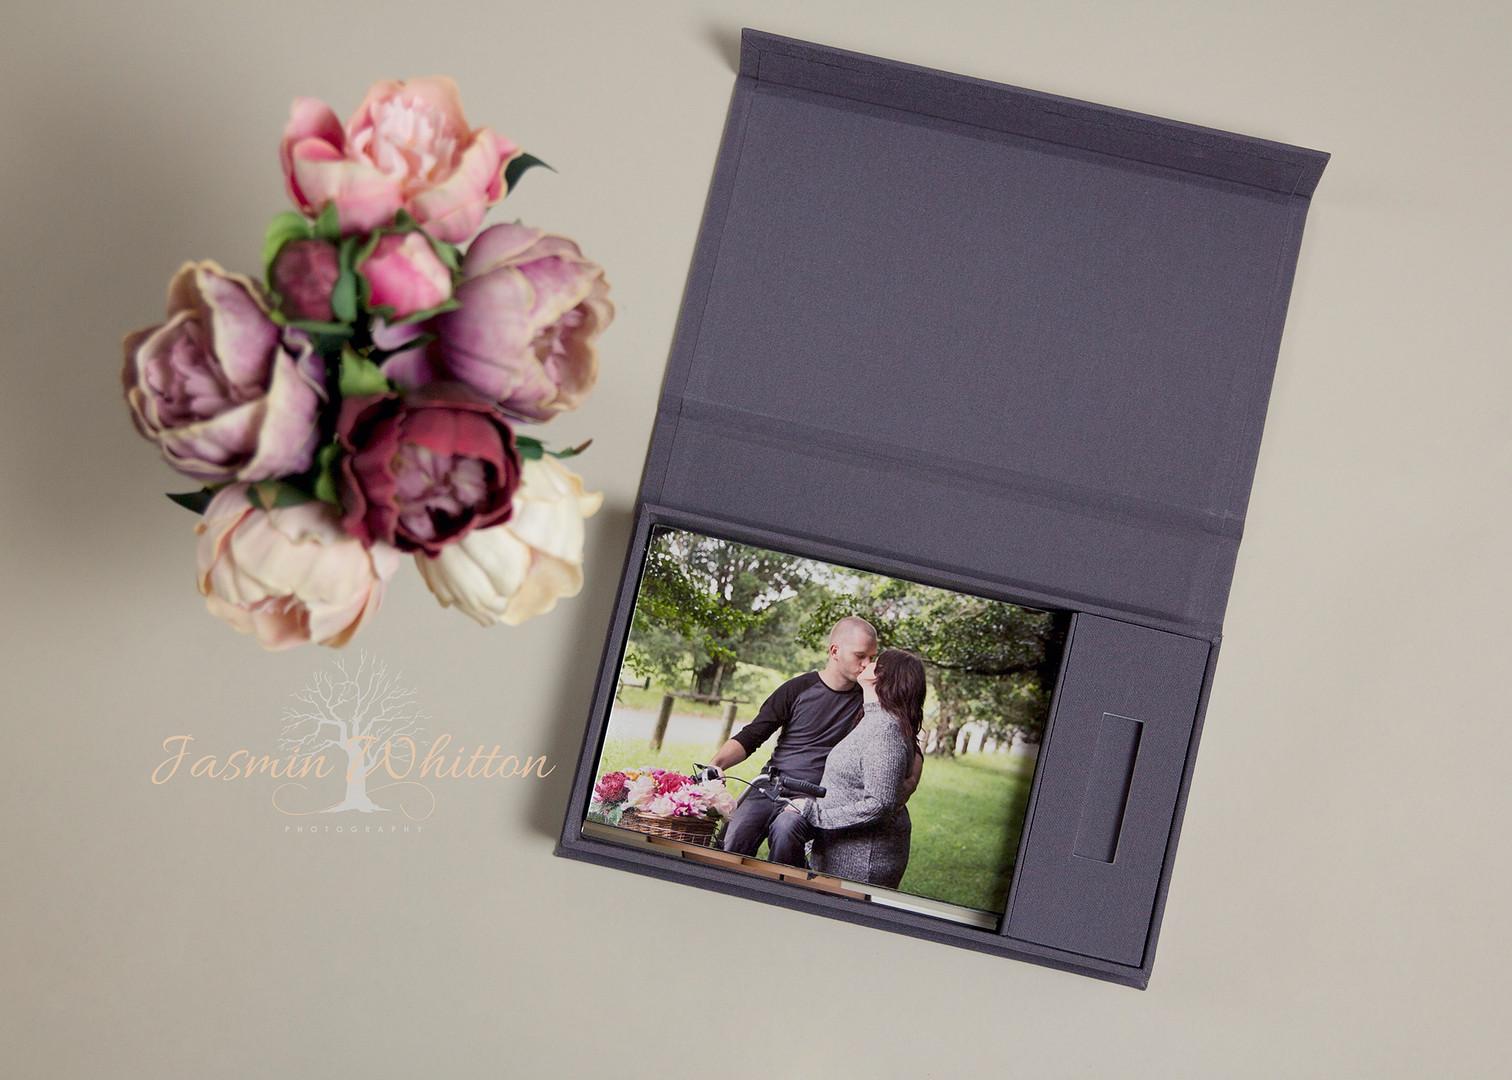 7x5 inch Print and USB Box